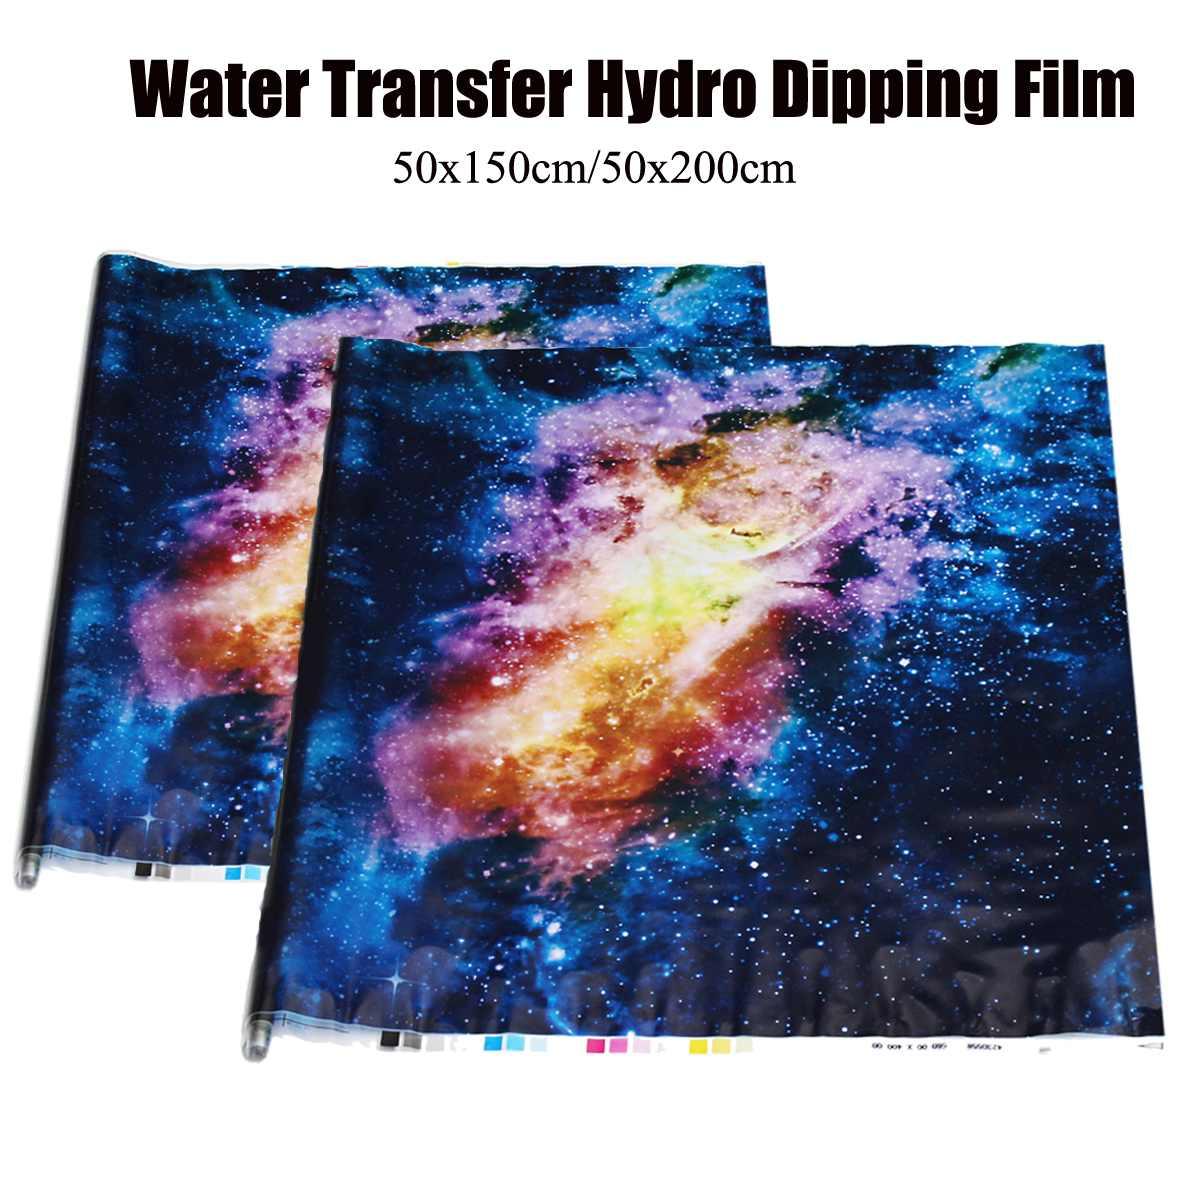 50x150cm/50x200cm Starry Sky PVA Hydrographic Water Transfer Printing Hydro Dipping DIP Print Film